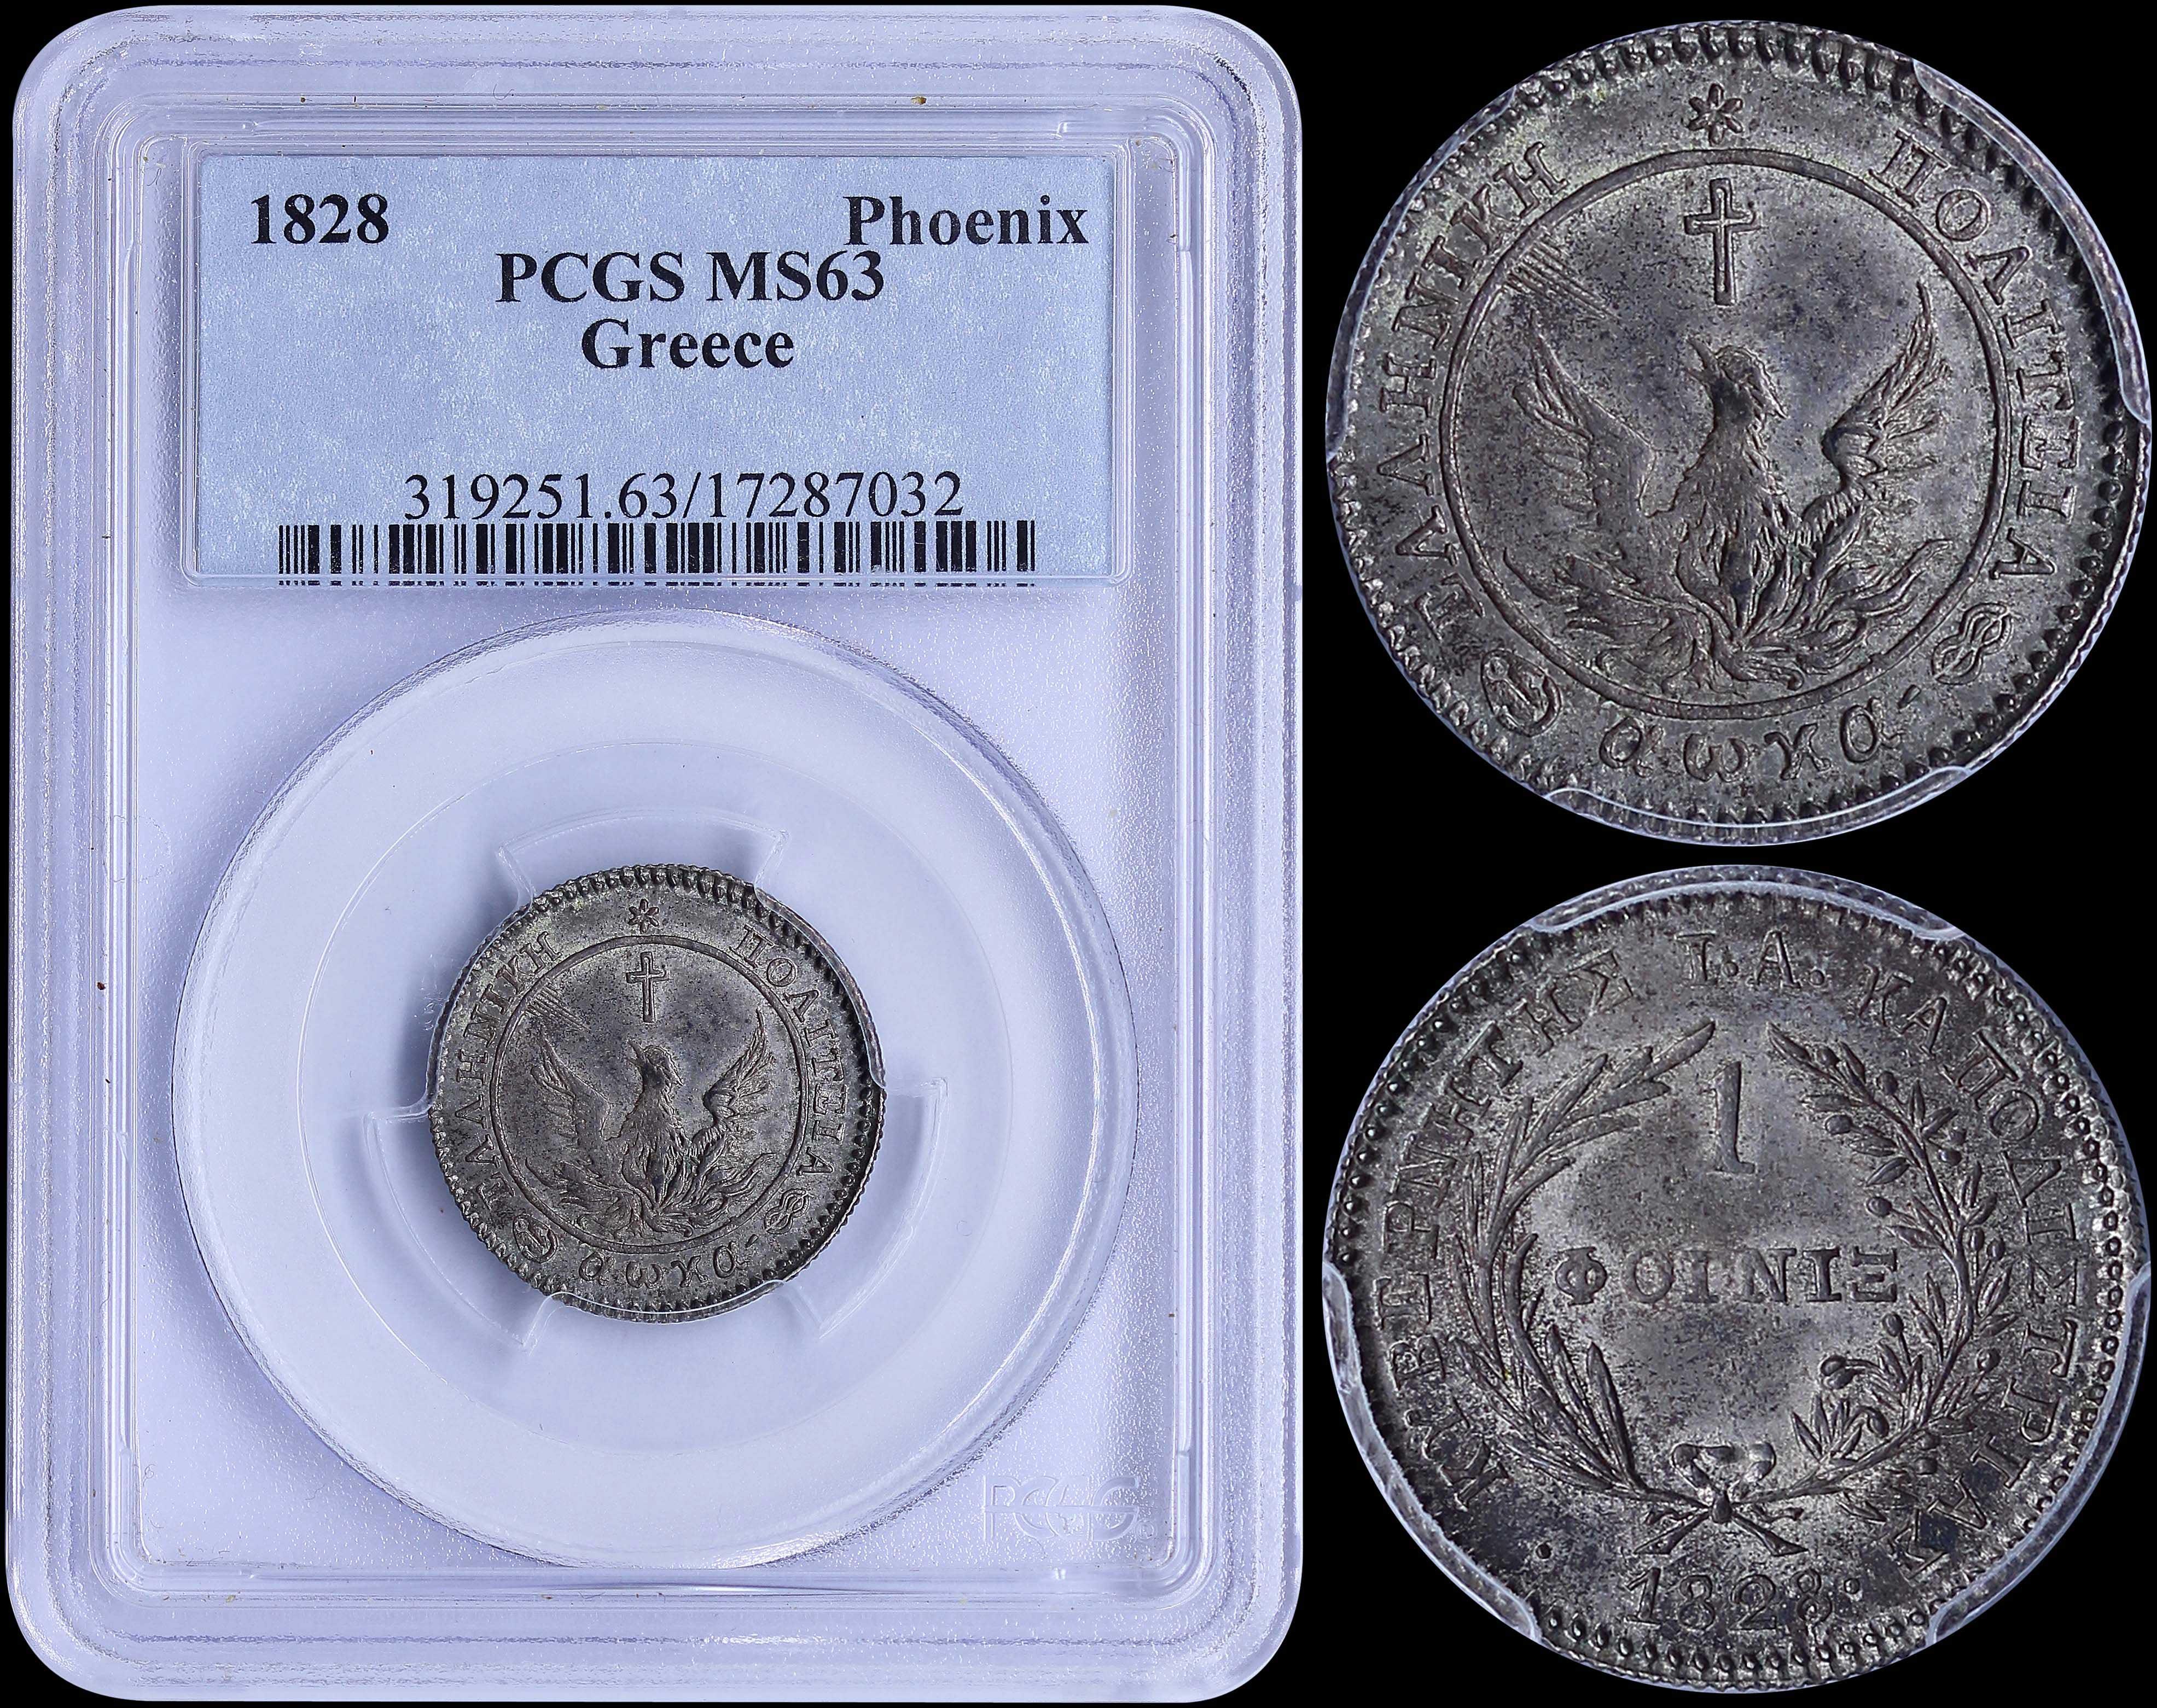 Lot 8020 - -  COINS & TOKENS governor capodistrias -  A. Karamitsos Public & Live Bid Auction 649 Coins, Medals & Banknotes